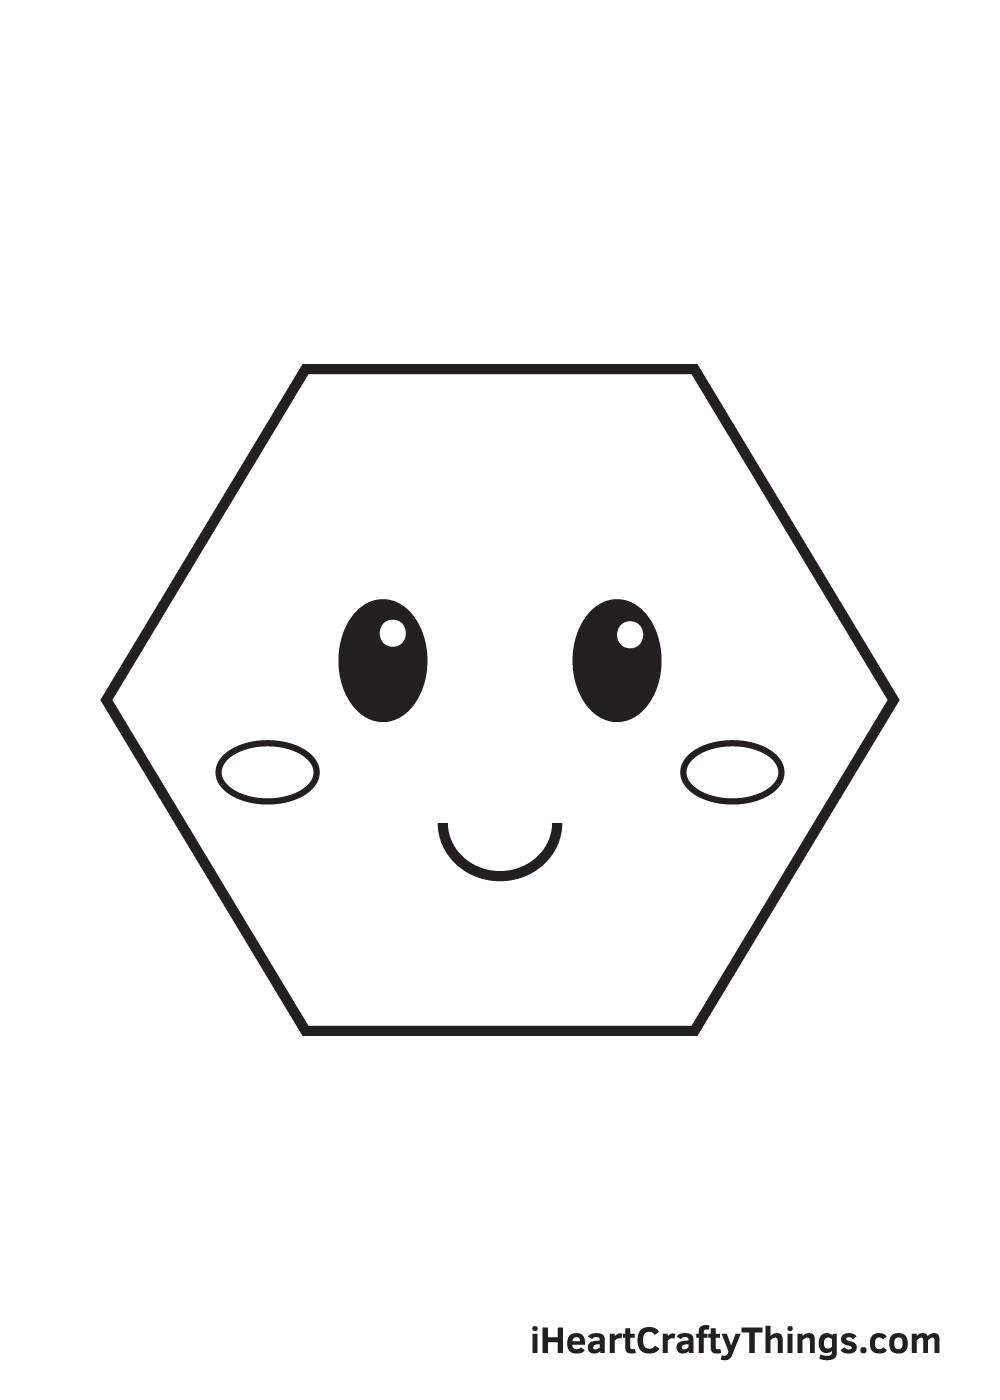 hexagon drawing step 9